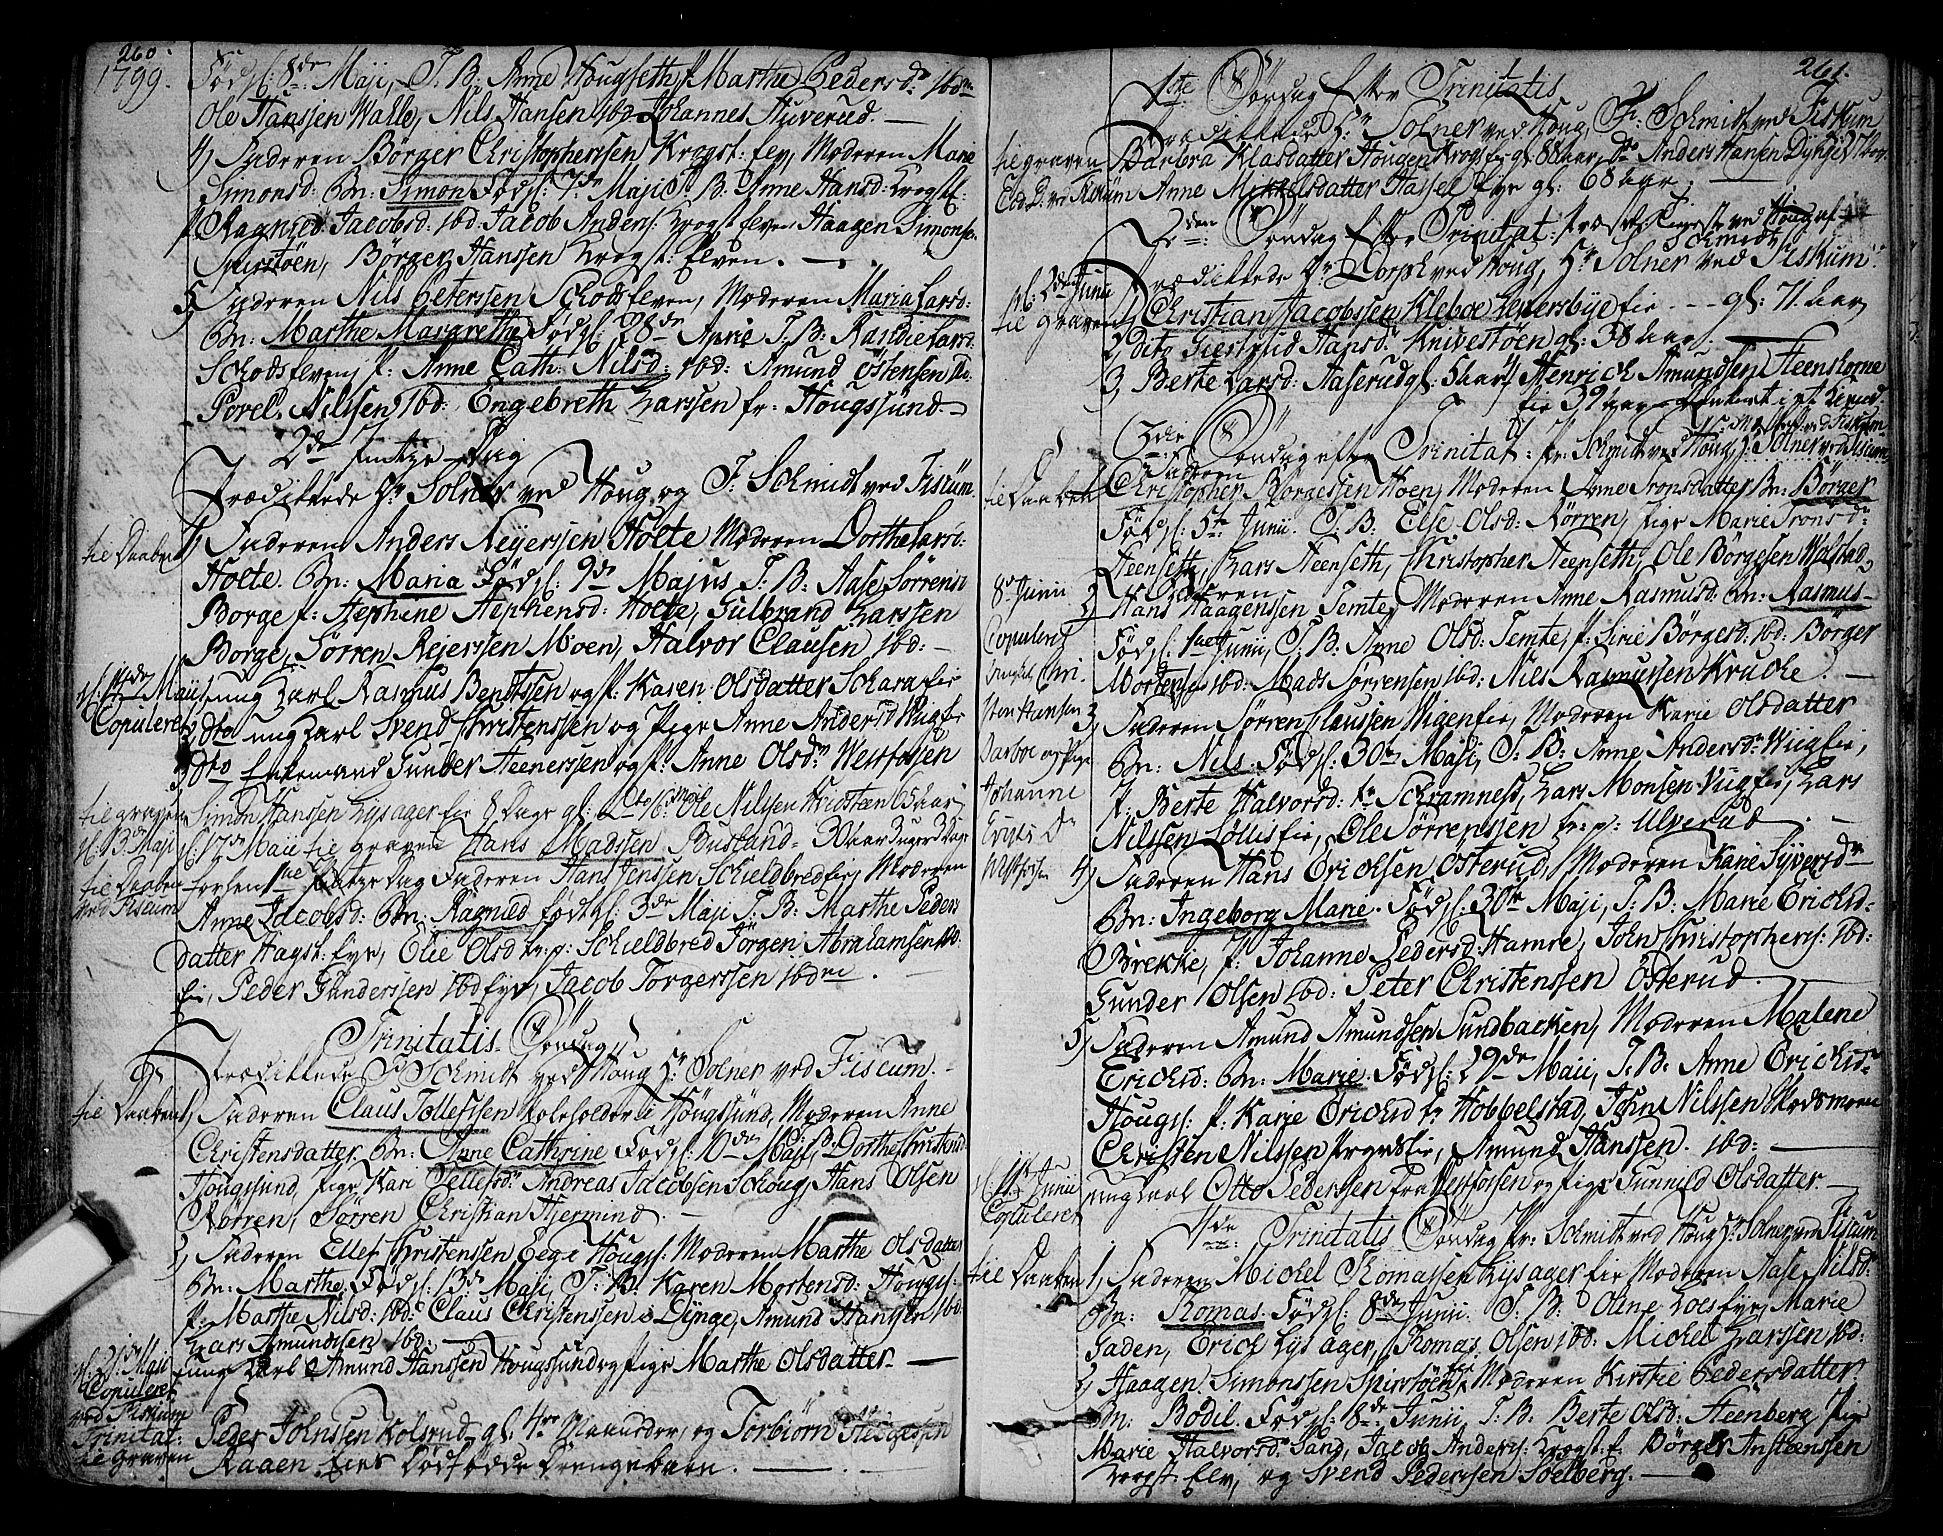 SAKO, Eiker kirkebøker, F/Fa/L0009: Ministerialbok nr. I 9, 1789-1806, s. 260-261